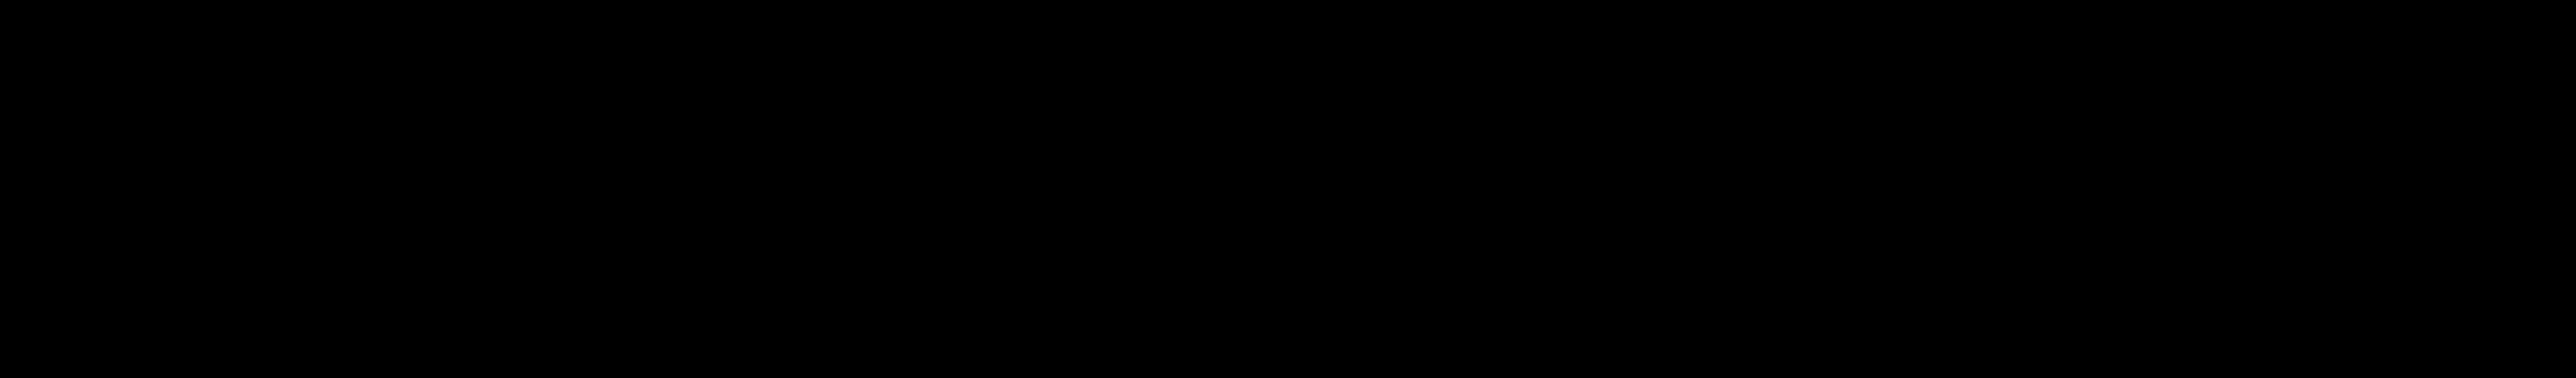 broeisans